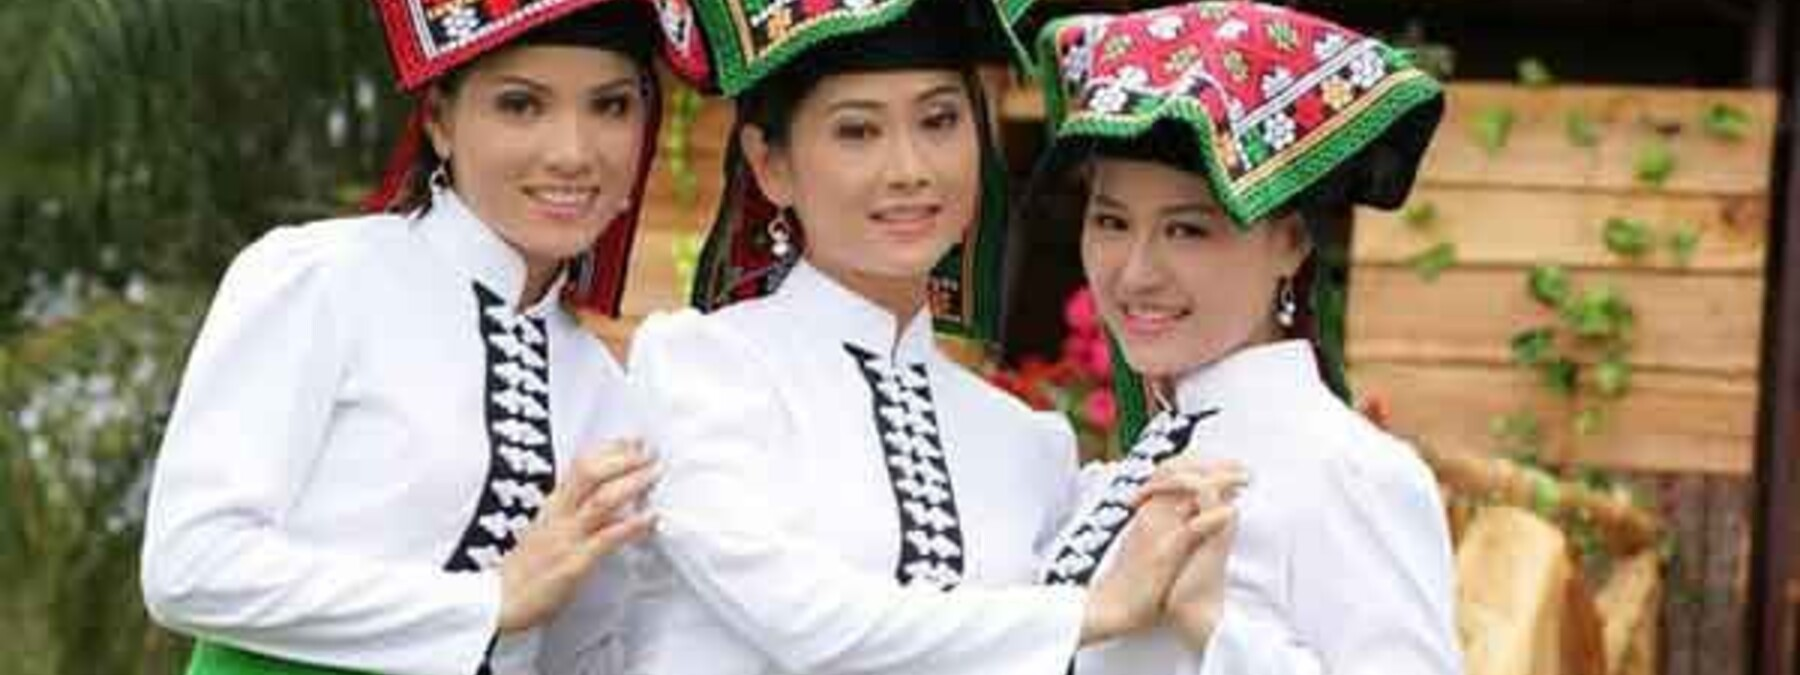 voyage vietnam pas cher voyage vietnam pas cher